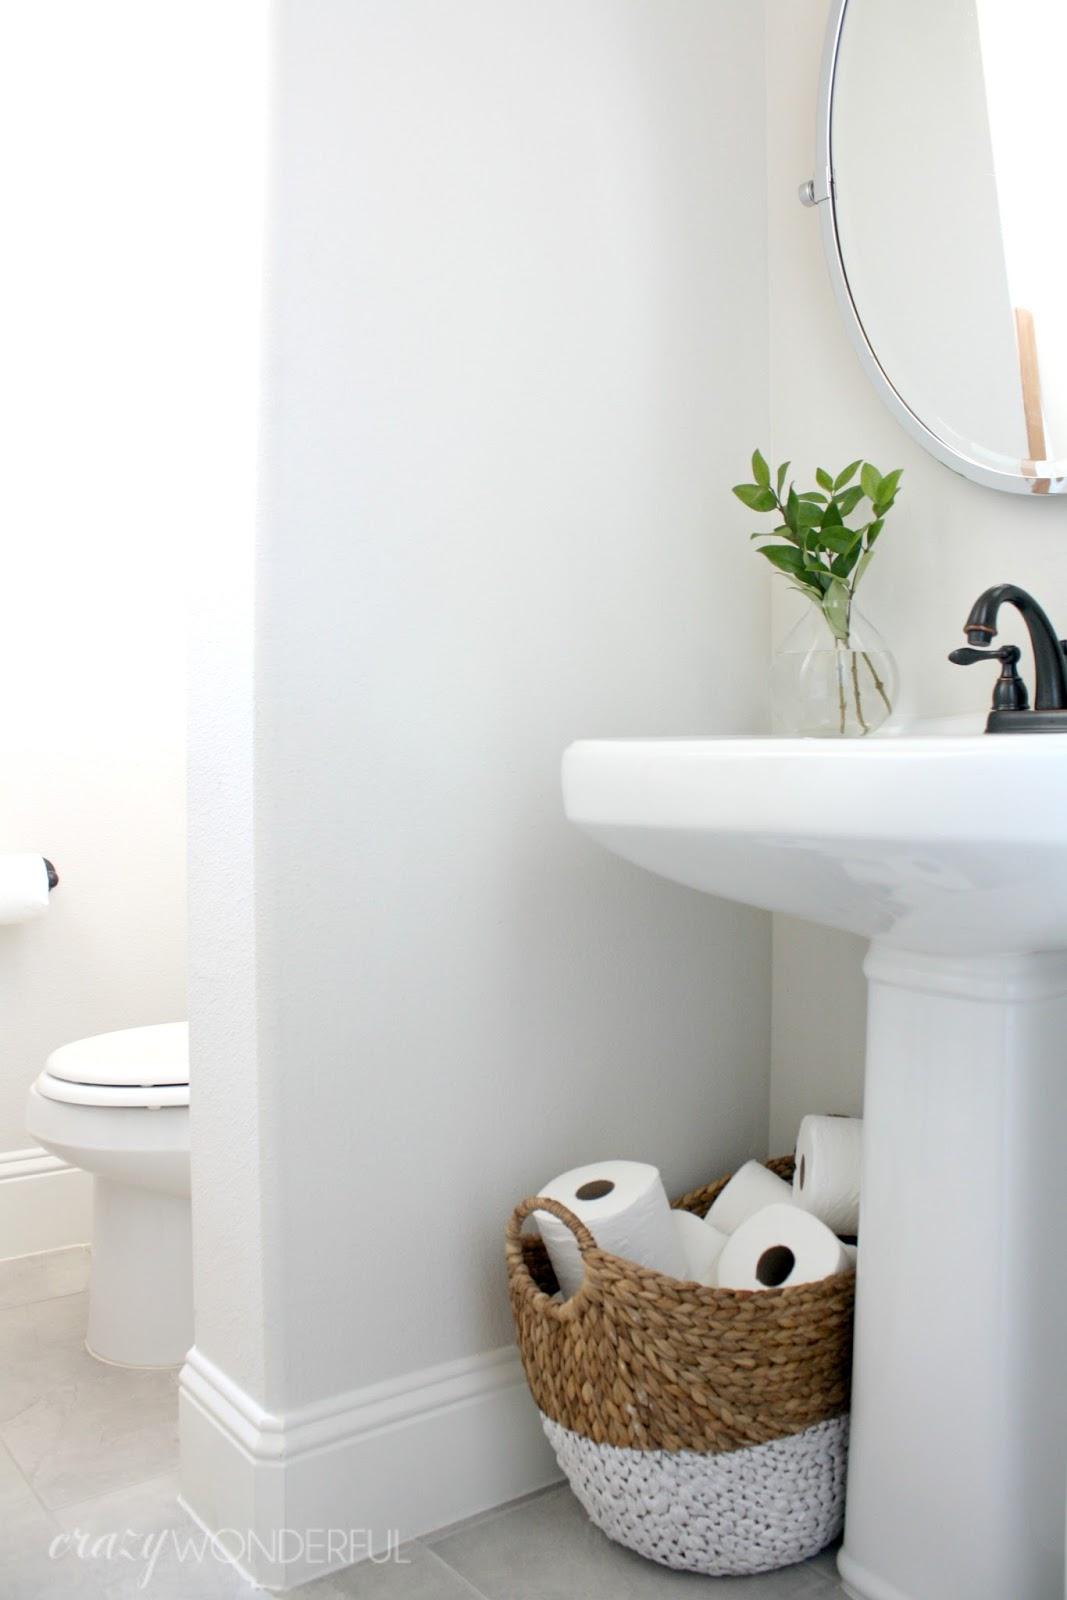 Our powder room crazy wonderful for Small mens bathroom ideas